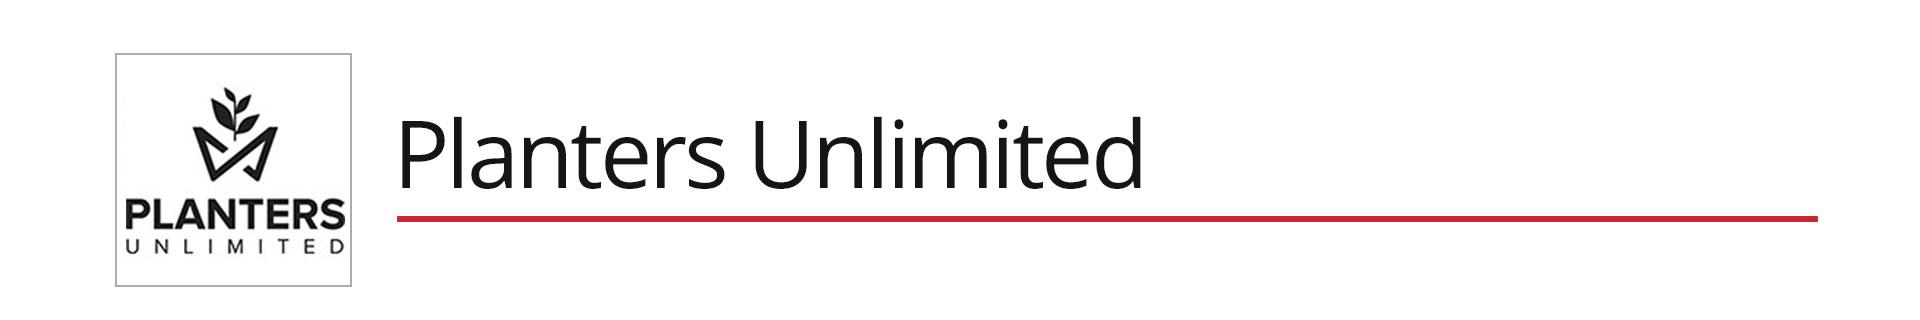 Planters-Unlimited_CADBlock-Header.jpg